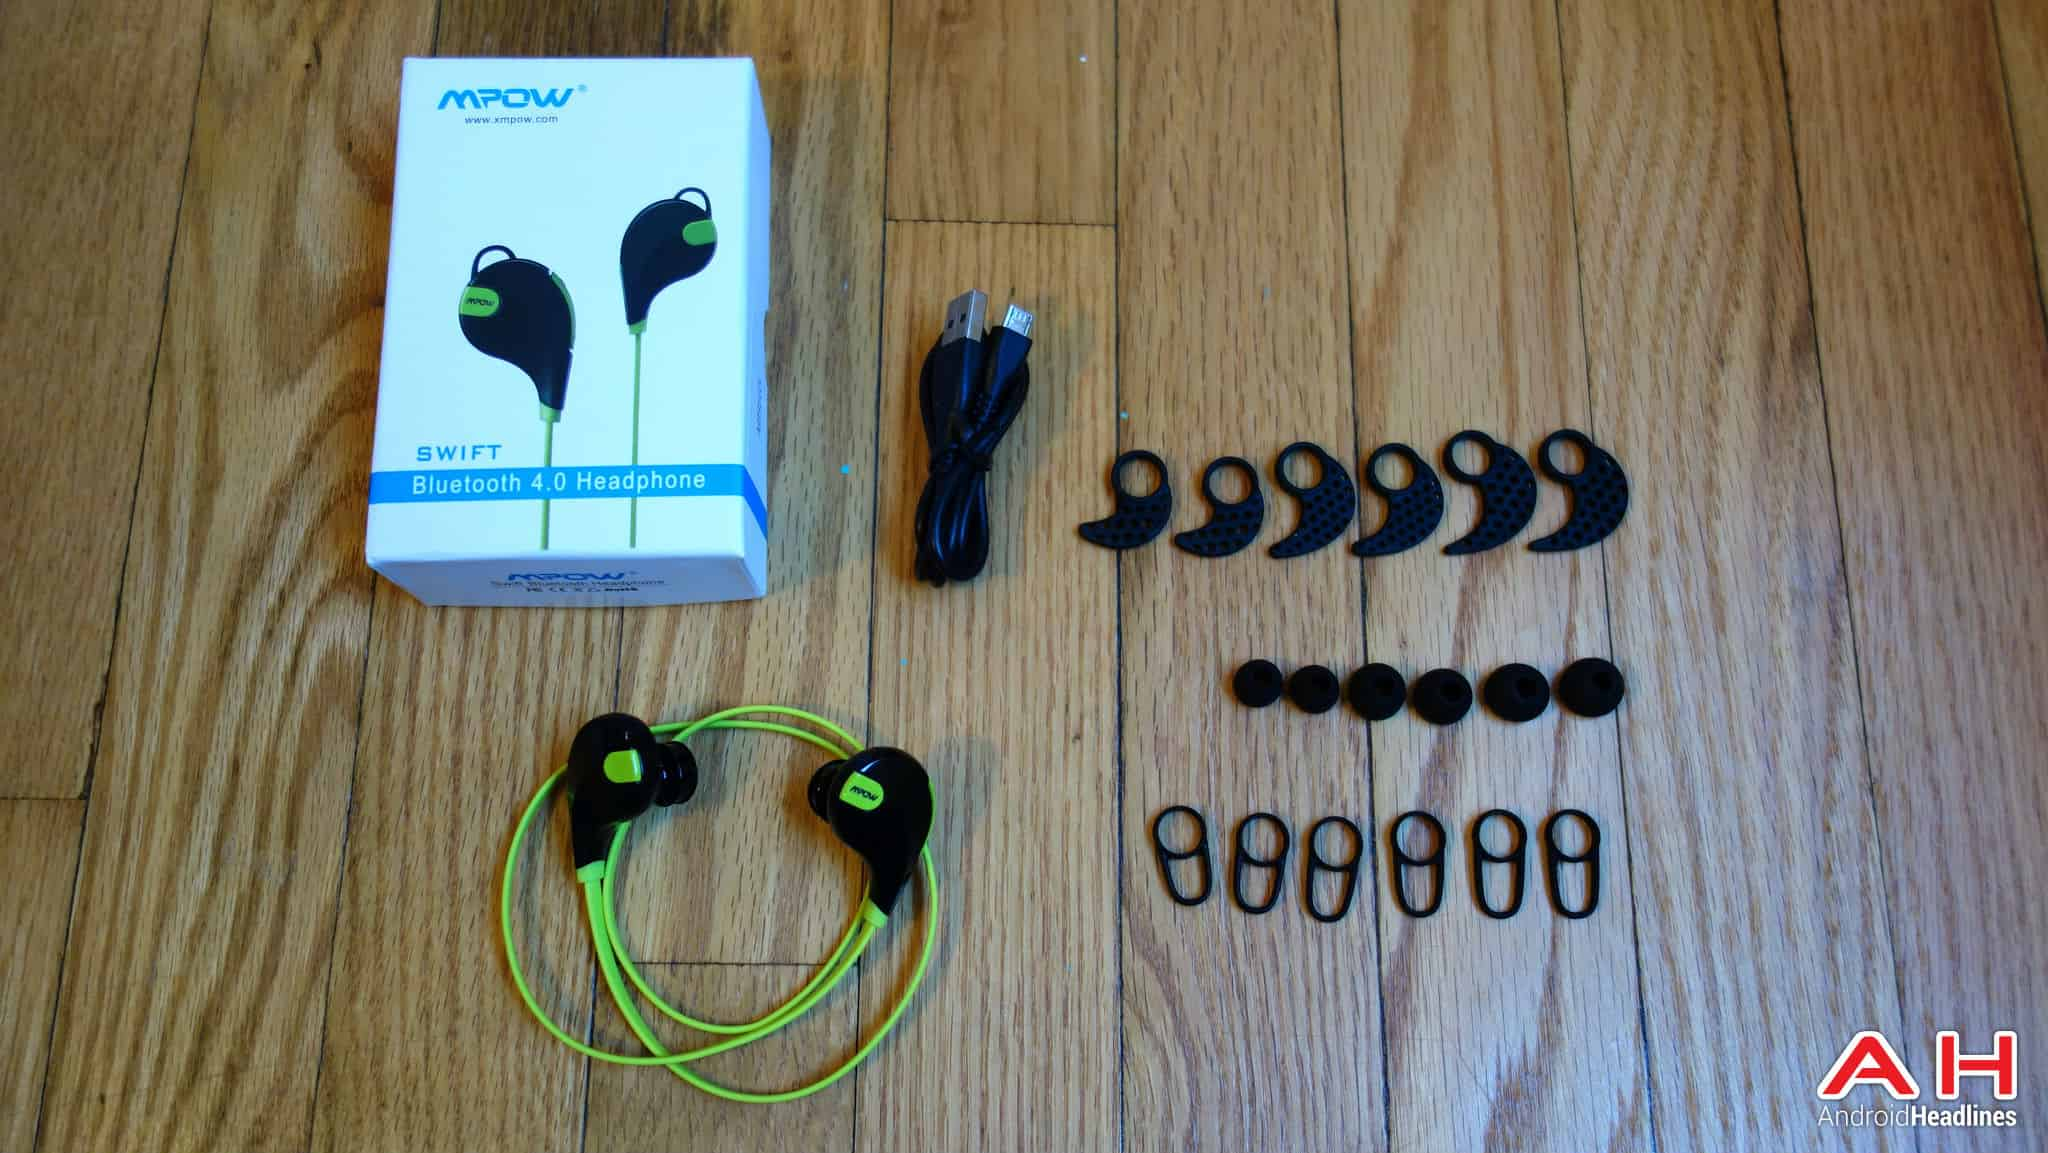 mpow swift bluetooth headphones